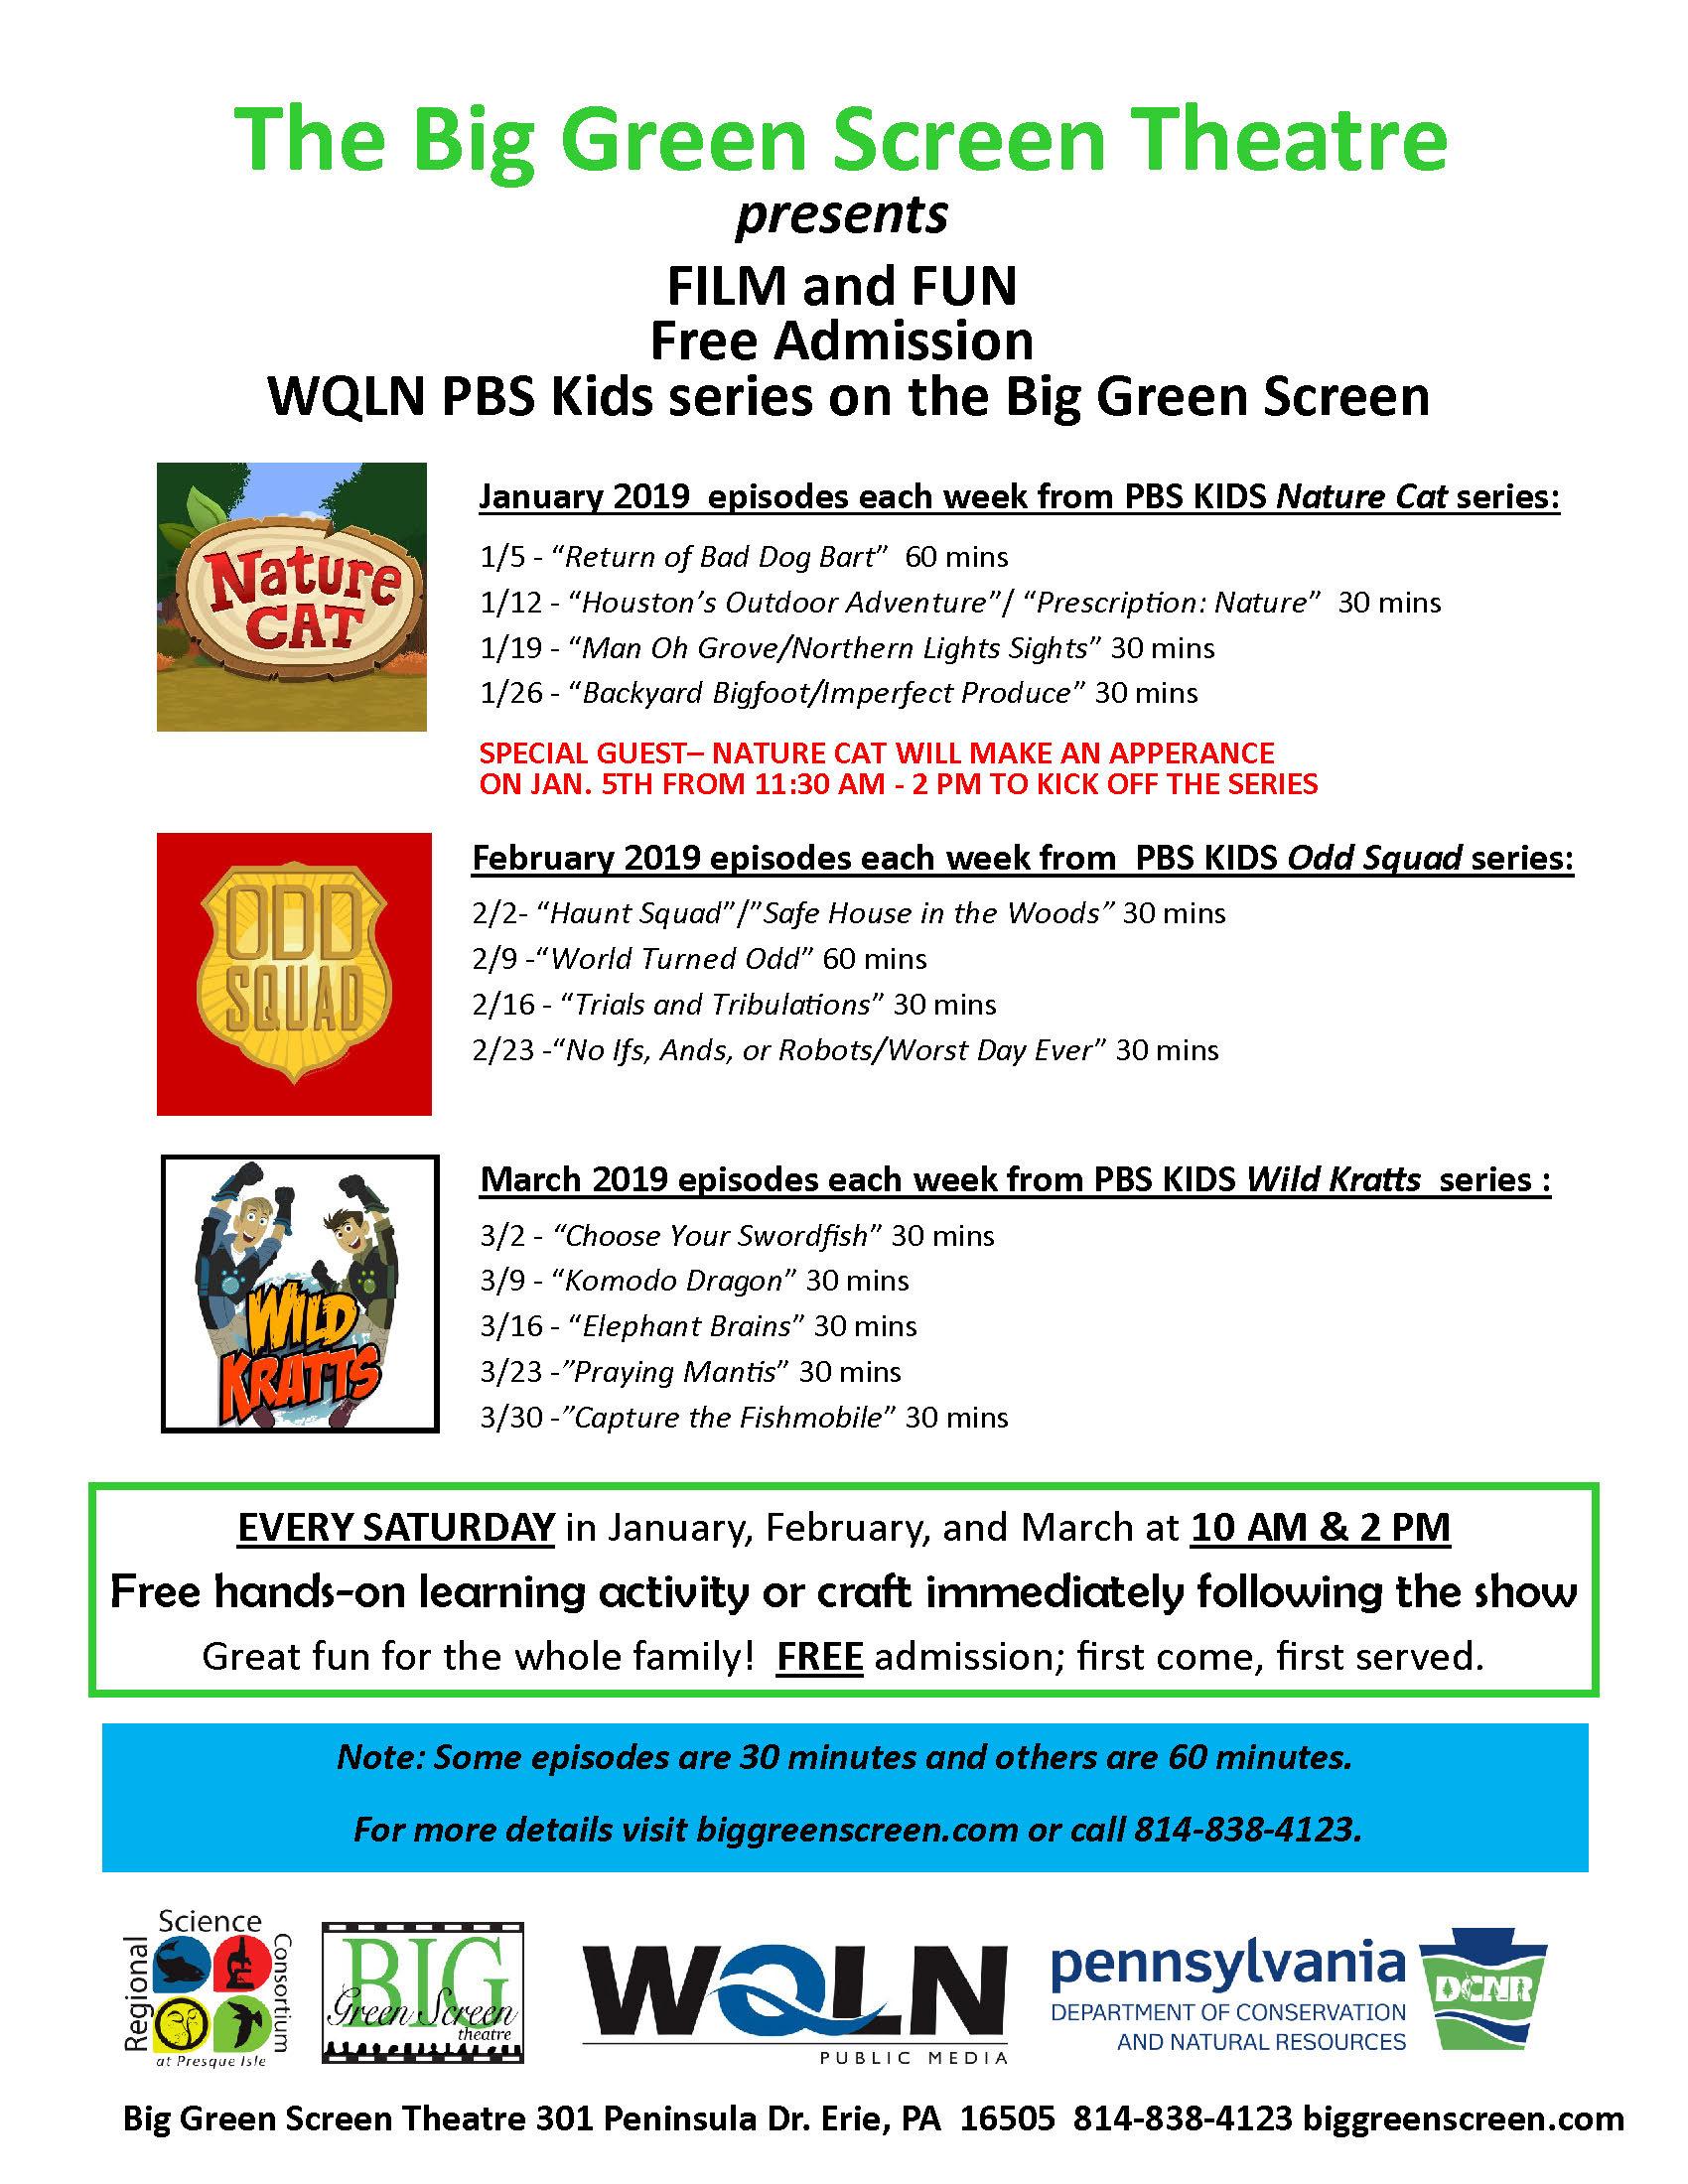 WQLN Film and Fun series.jpg